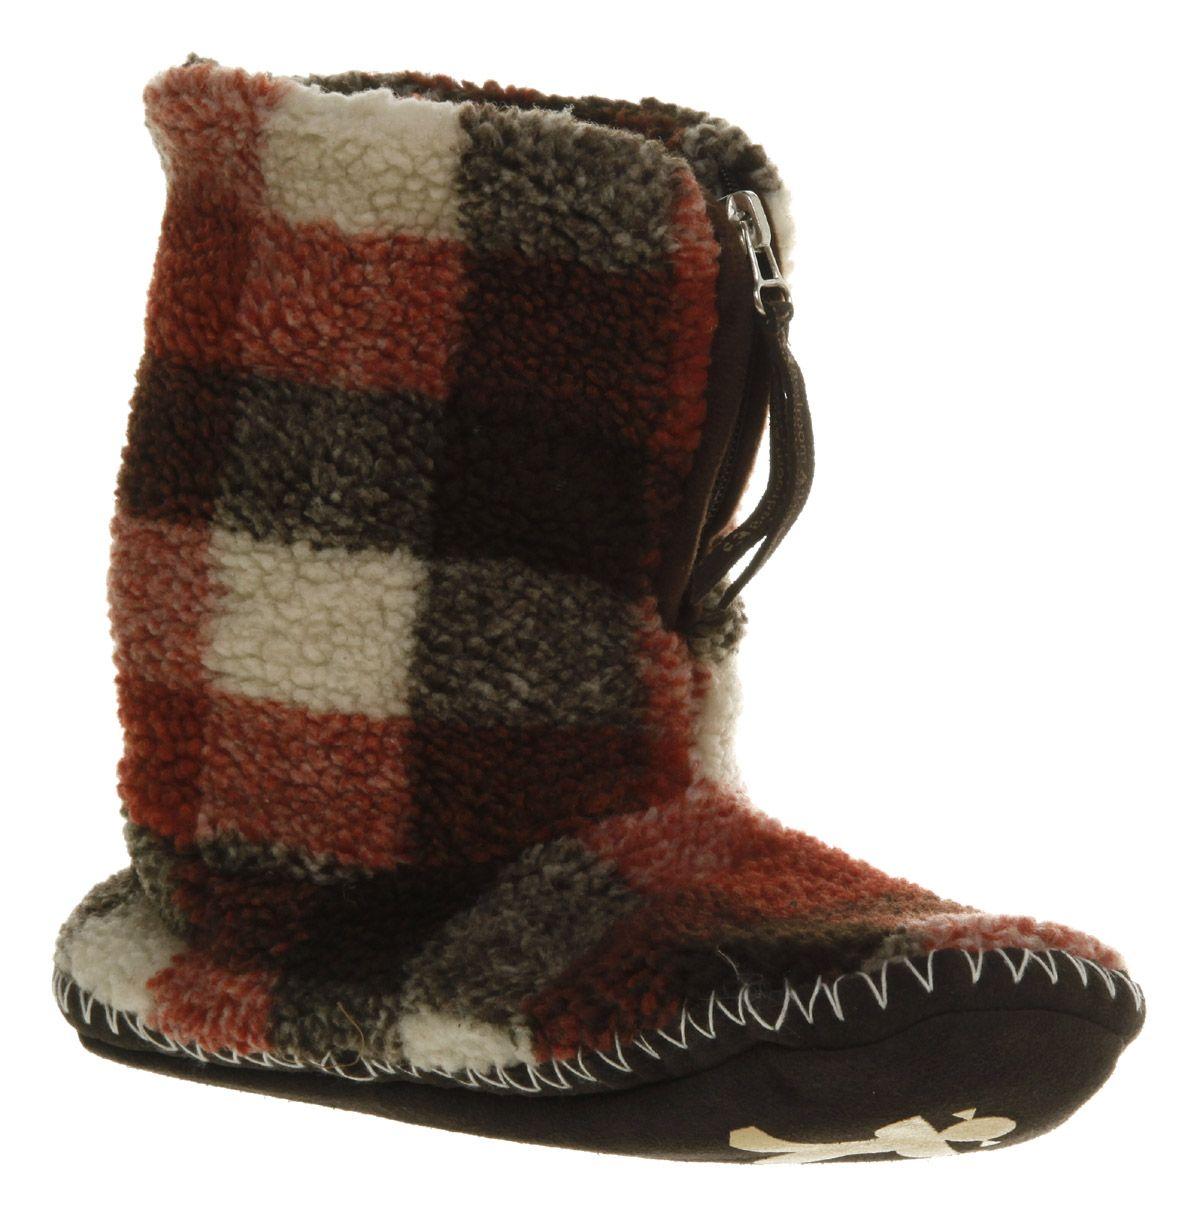 Bedroom Athletics Macgraw Fleece Slipper Chocolate Red Cream - Ankle Boots